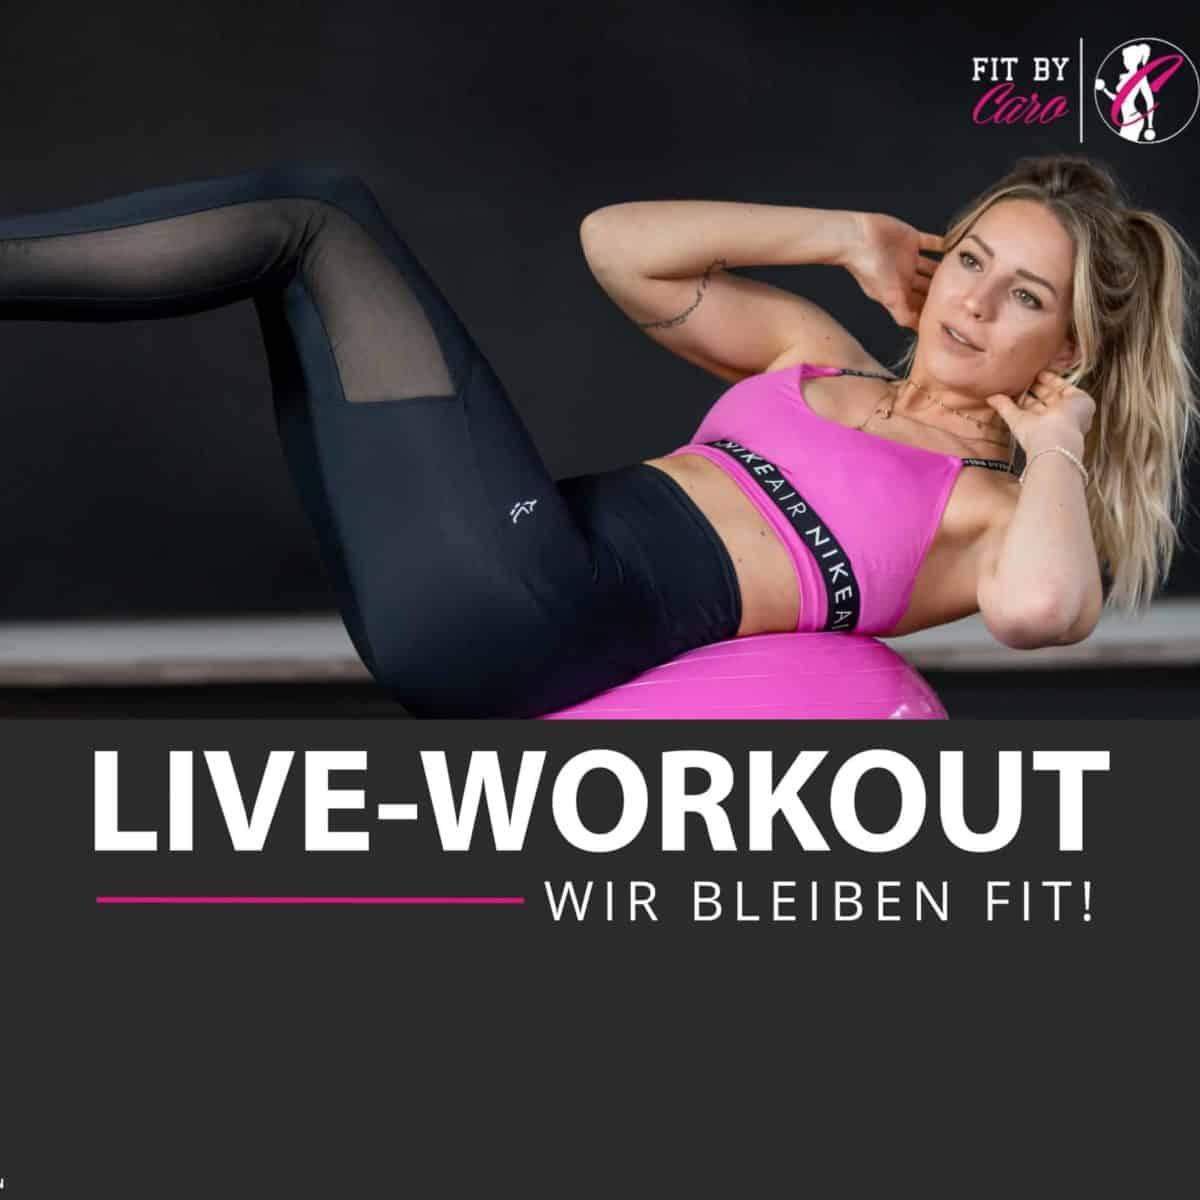 Fitbycaro Workout-Übung